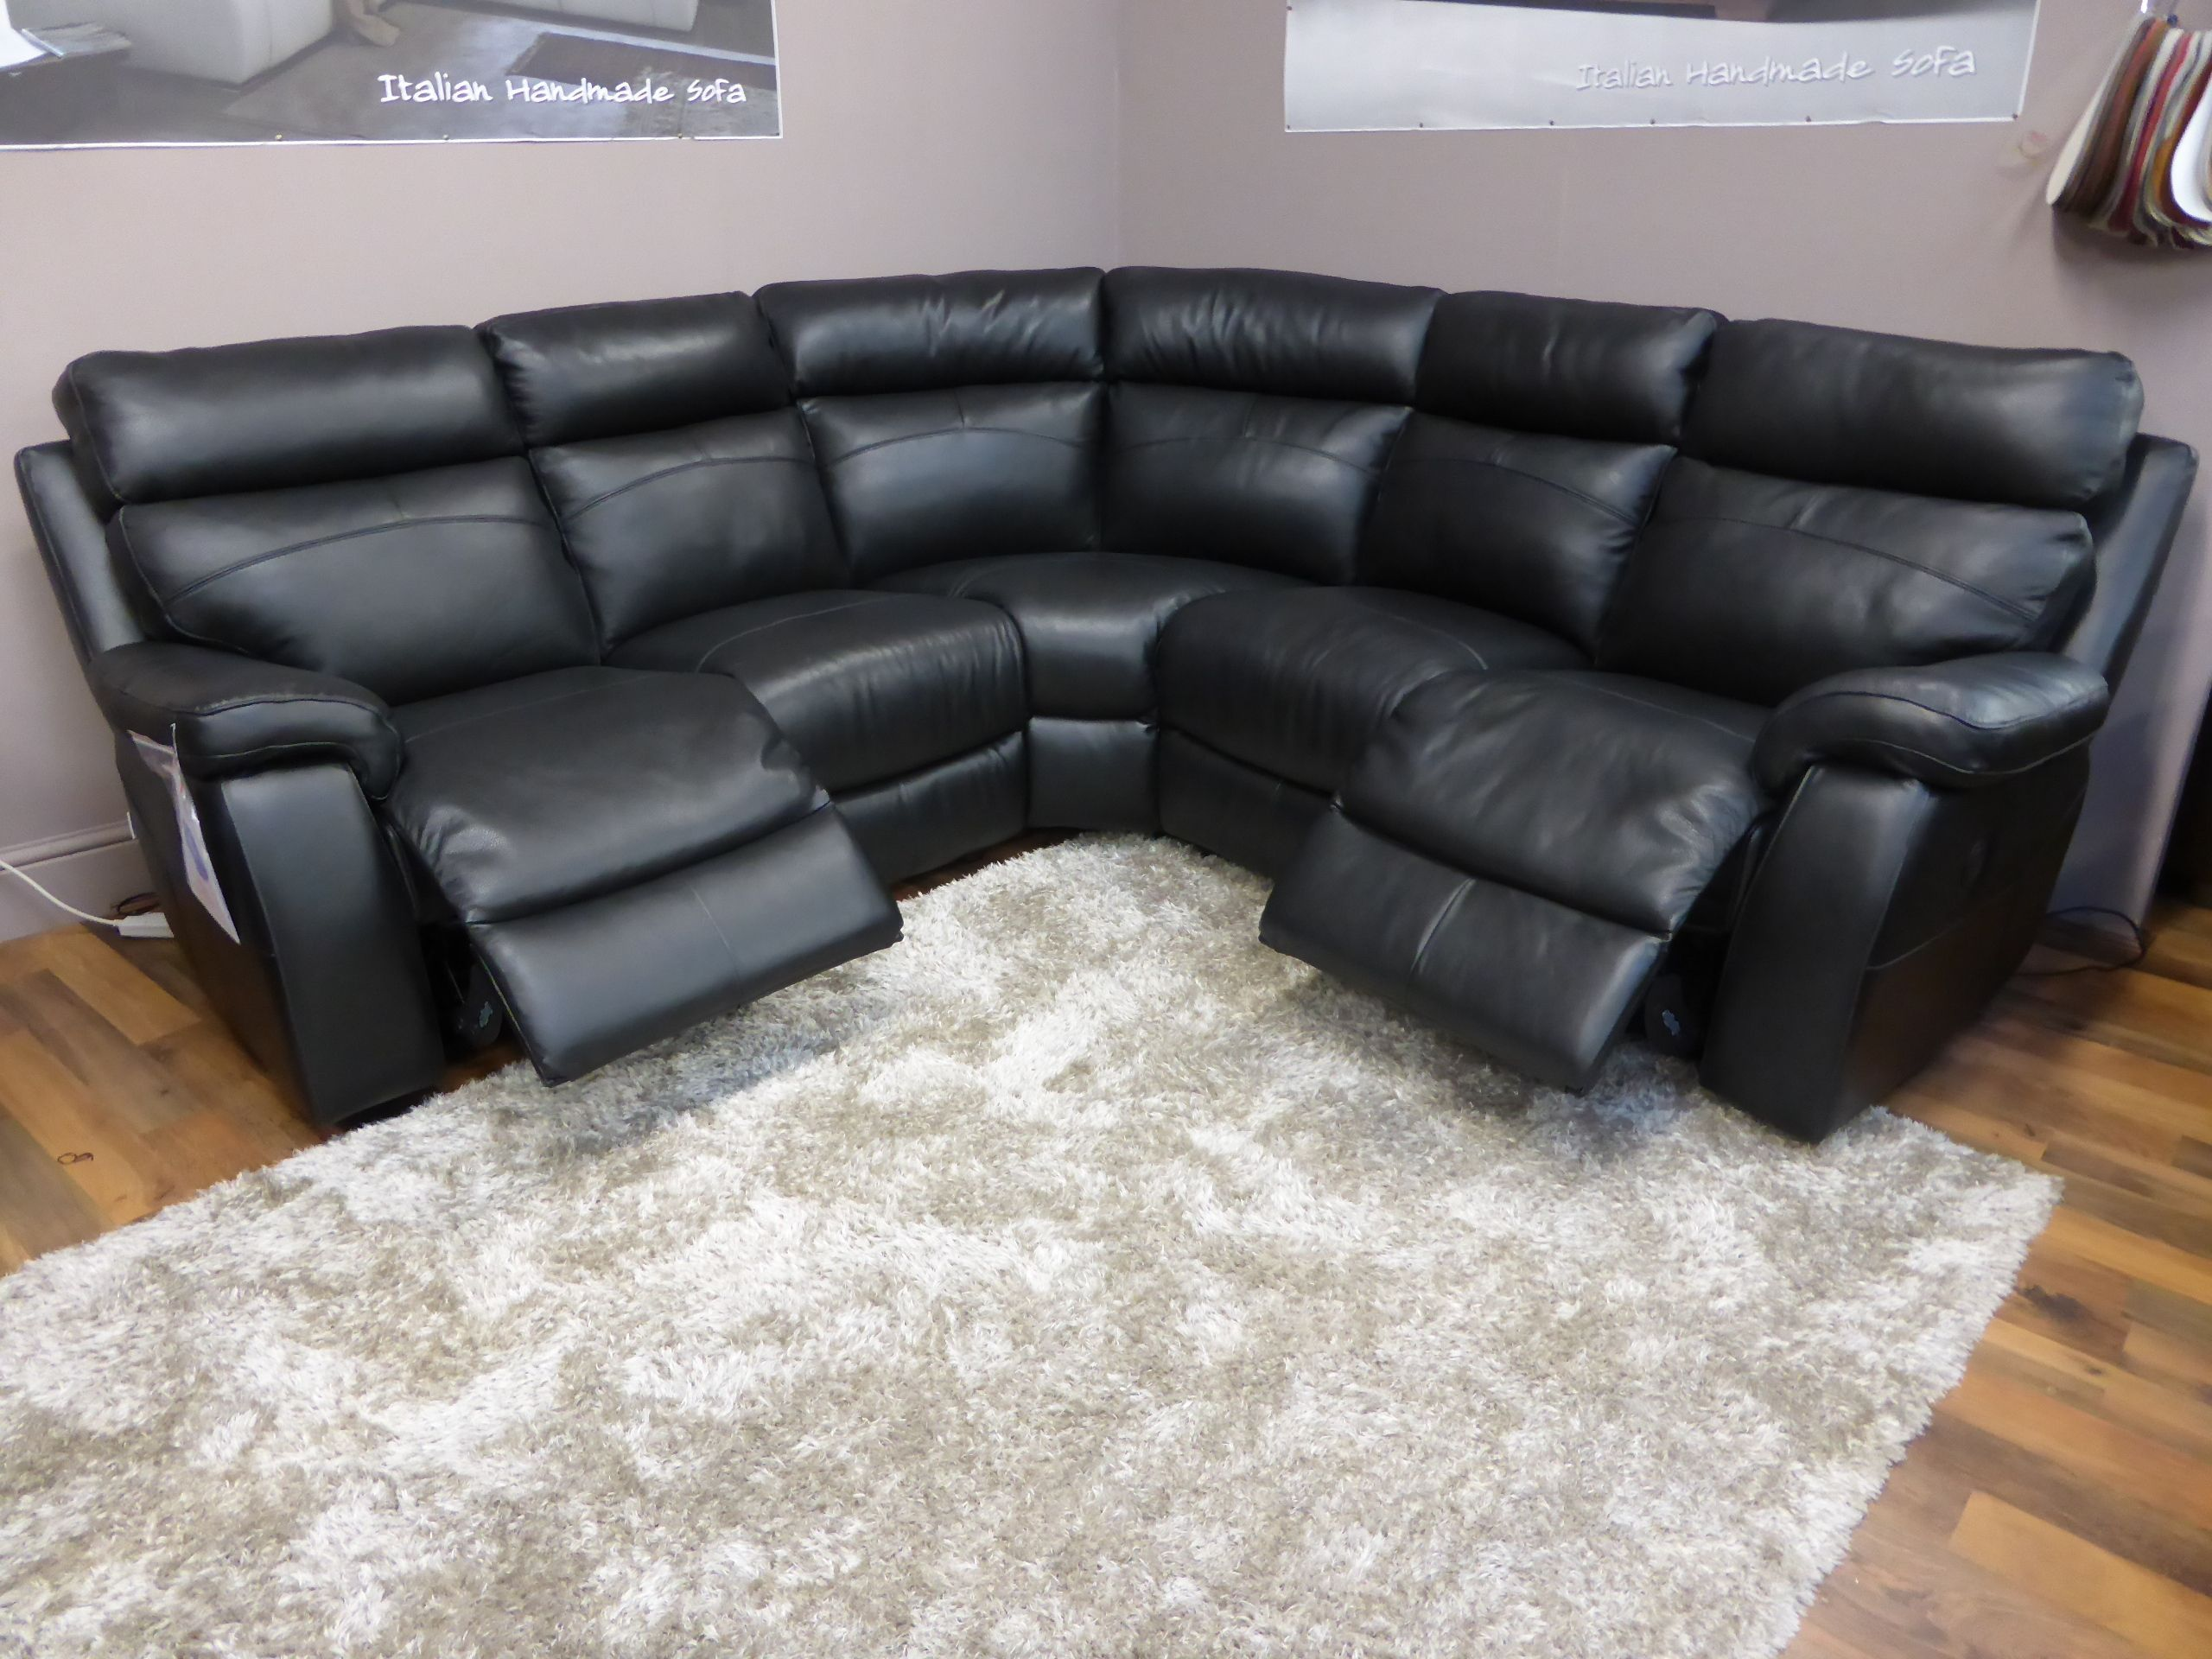 Lazy Boy Sofa Bed Couch Homedecor Homedecorideas In 2020